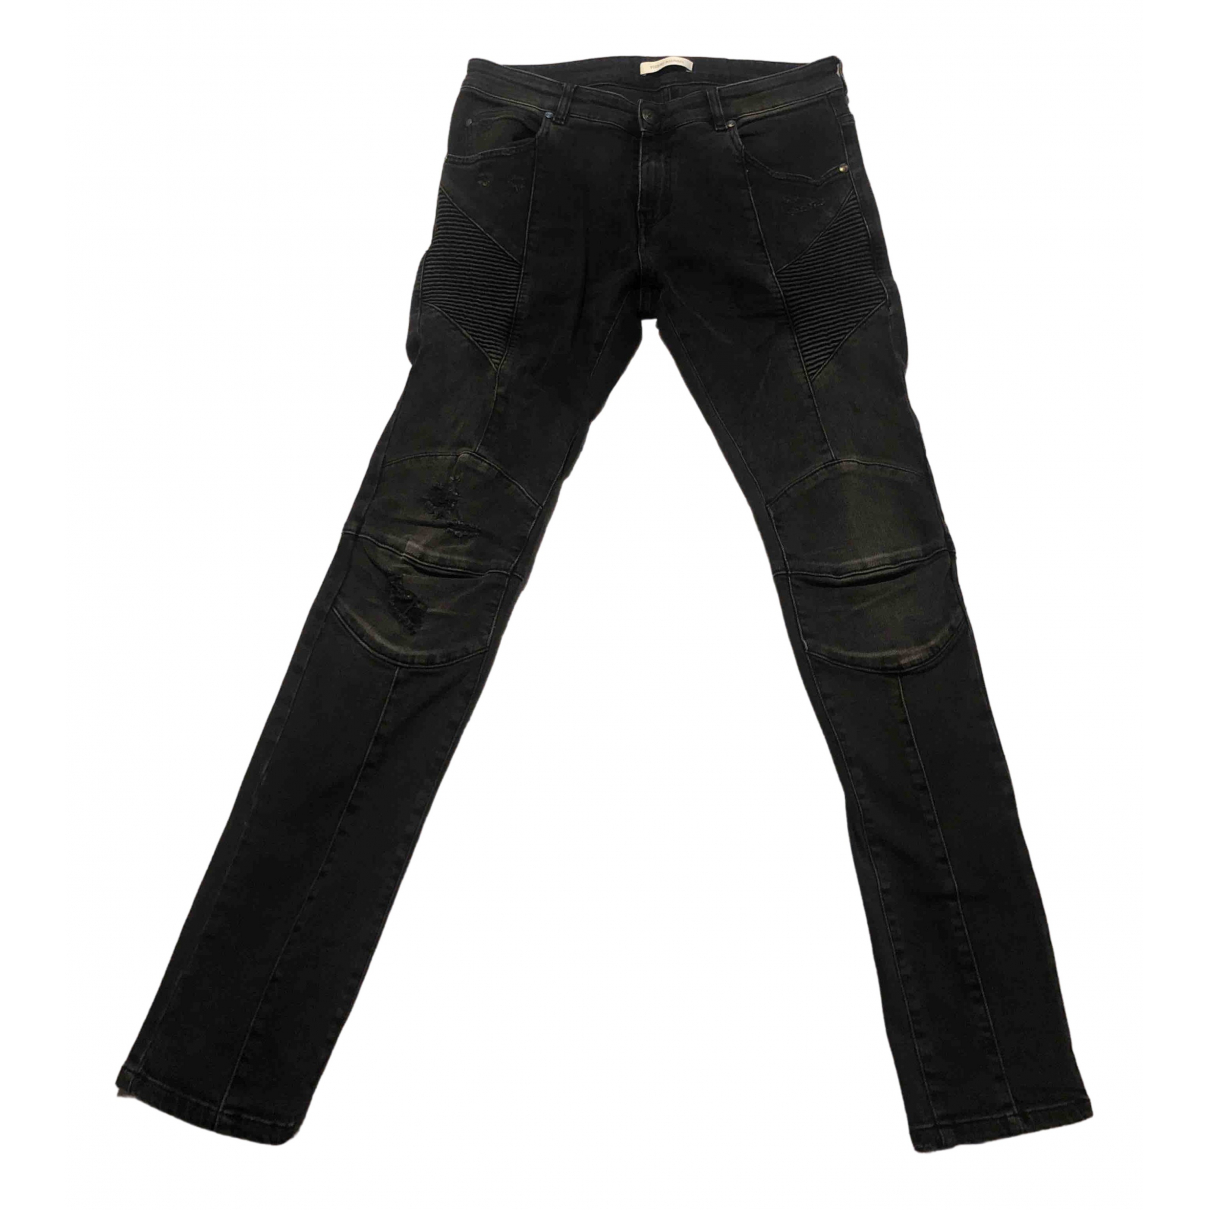 Pierre Balmain \N Black Cotton - elasthane Jeans for Men 34 US